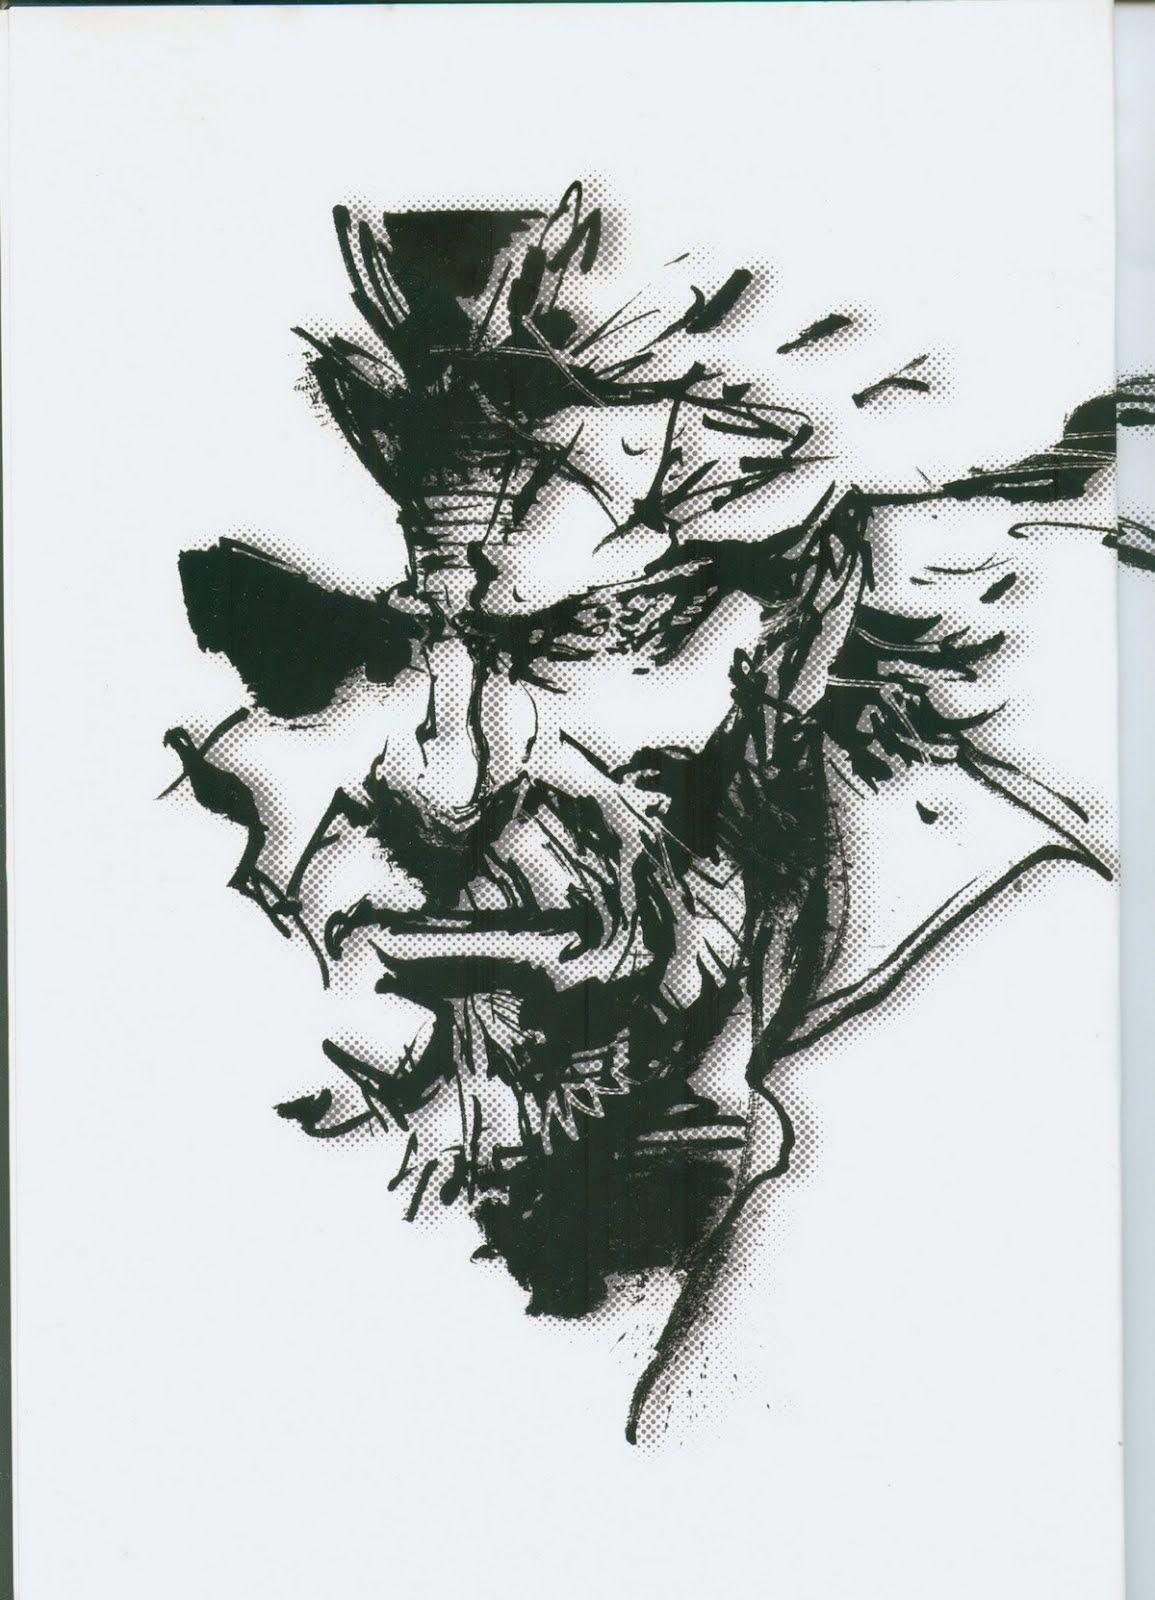 Yoji Shinkawa - The Art of Metal Gear Solid: Peace Walker | Madeleine Lilu Emelin